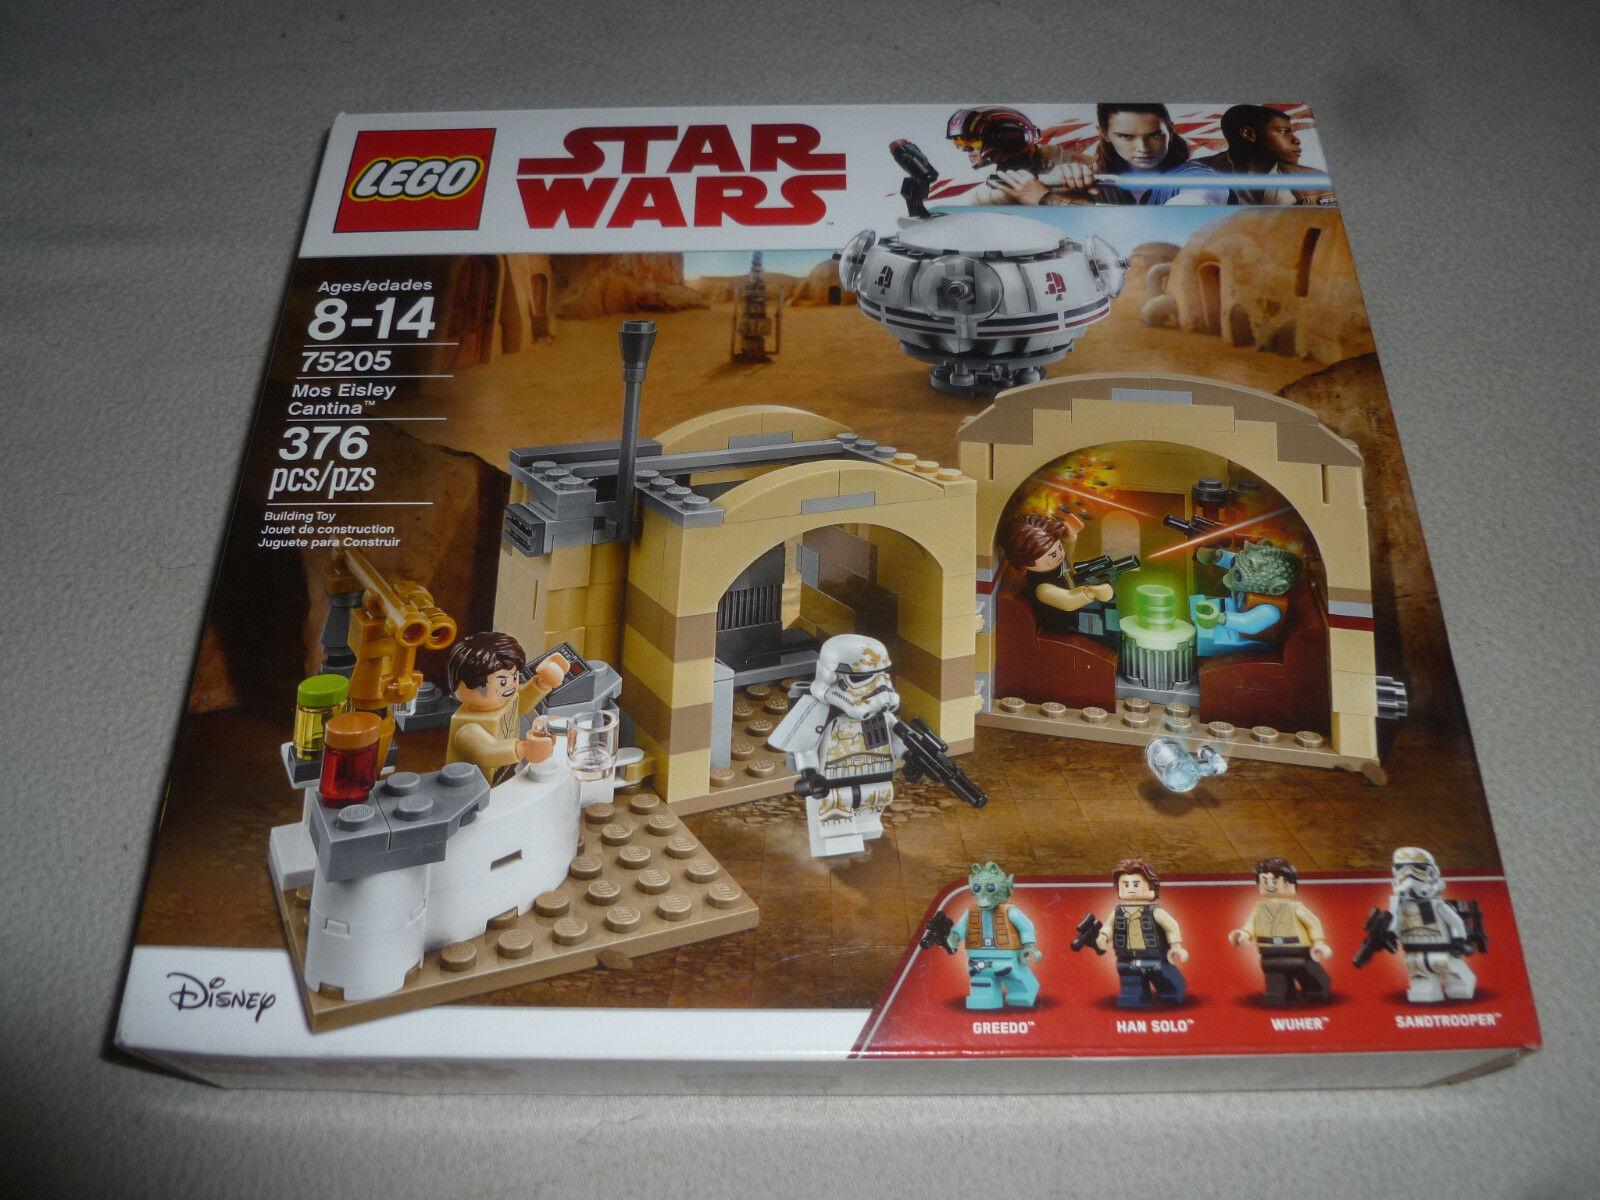 NEW IN BOX LEGO STAR STAR STAR WARS MOS EISLEY CANTINA 75205 GREEDO HAN SOLO SANDTROOPER   f2d1f0